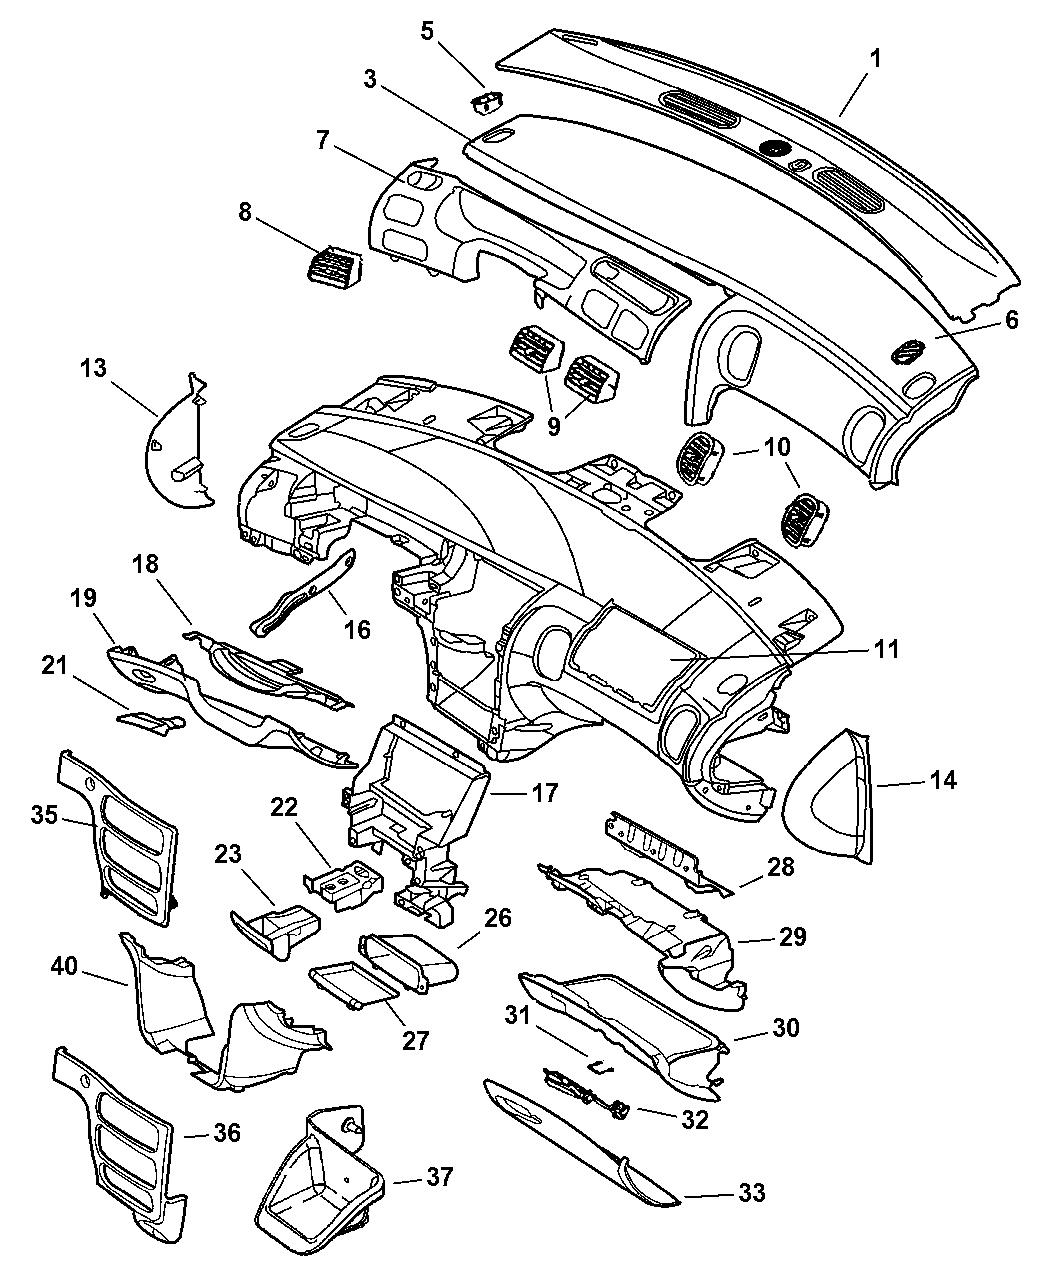 Dodge Intrepid Floor Mats: Genuine Dodge ASHTRAY-INSTRUMENT PANEL